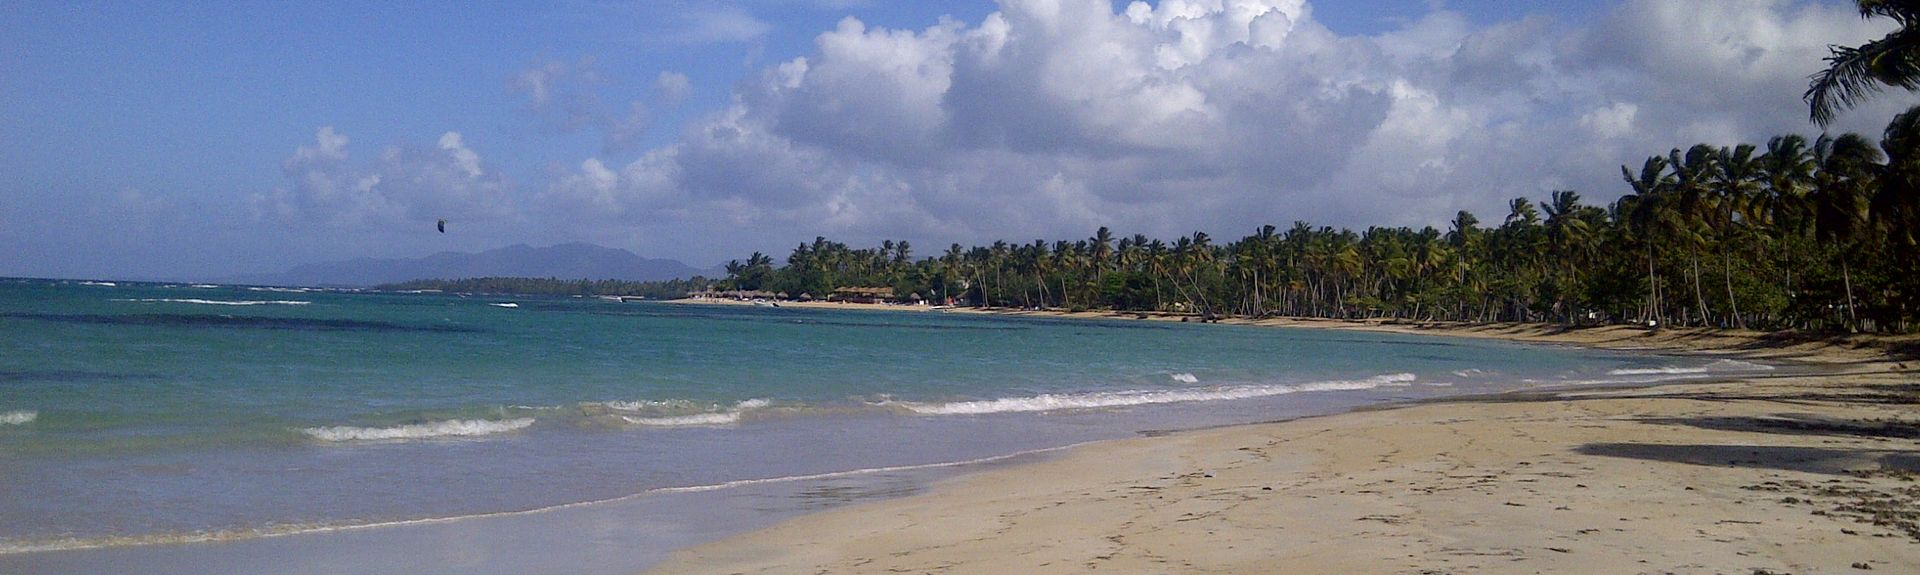 El Limon, Samana, den dominikanske republikk